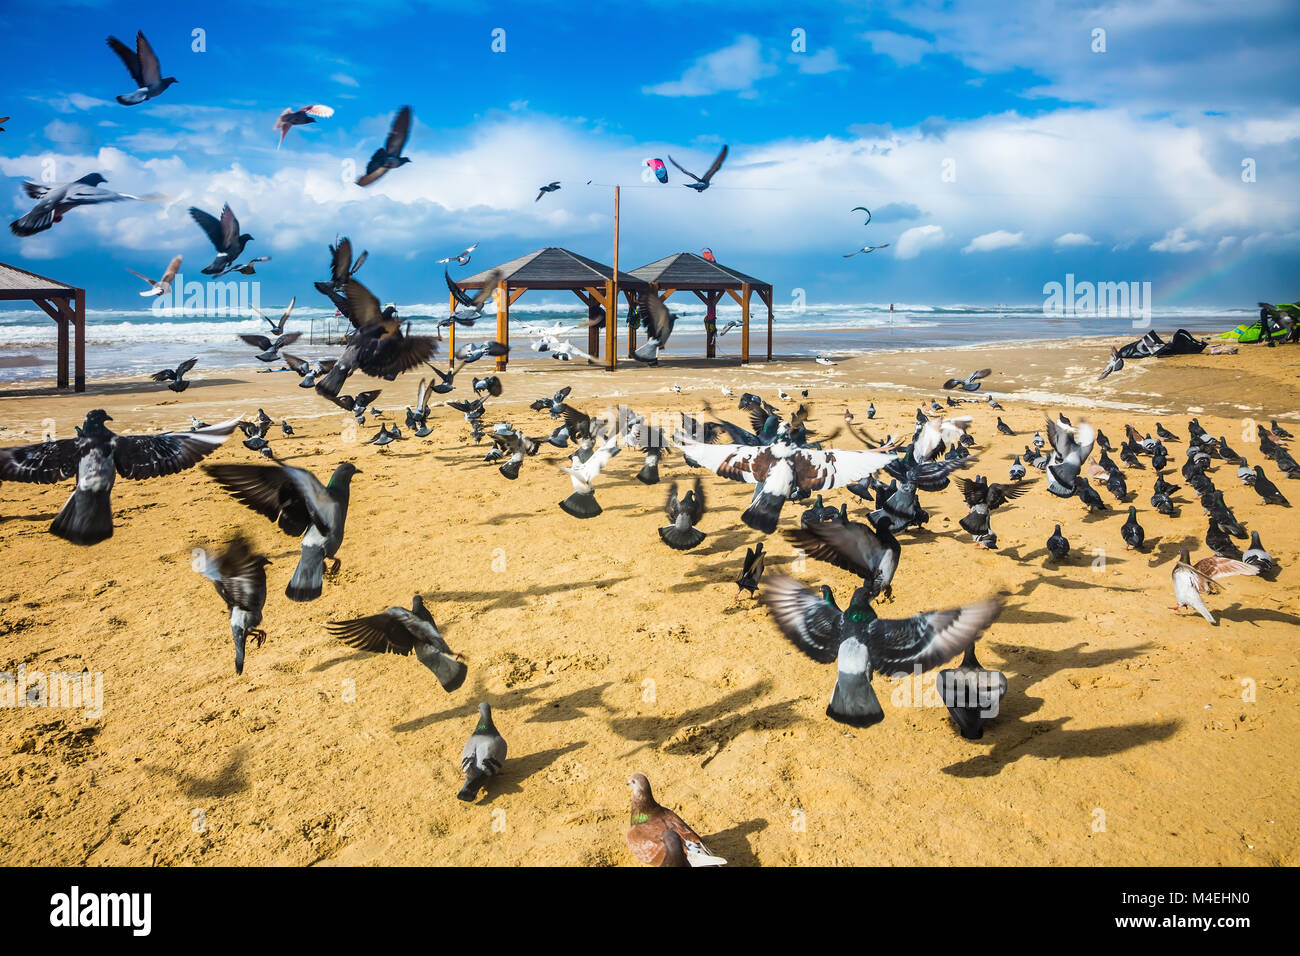 Flock of pigeons it is noisy departs - Stock Image